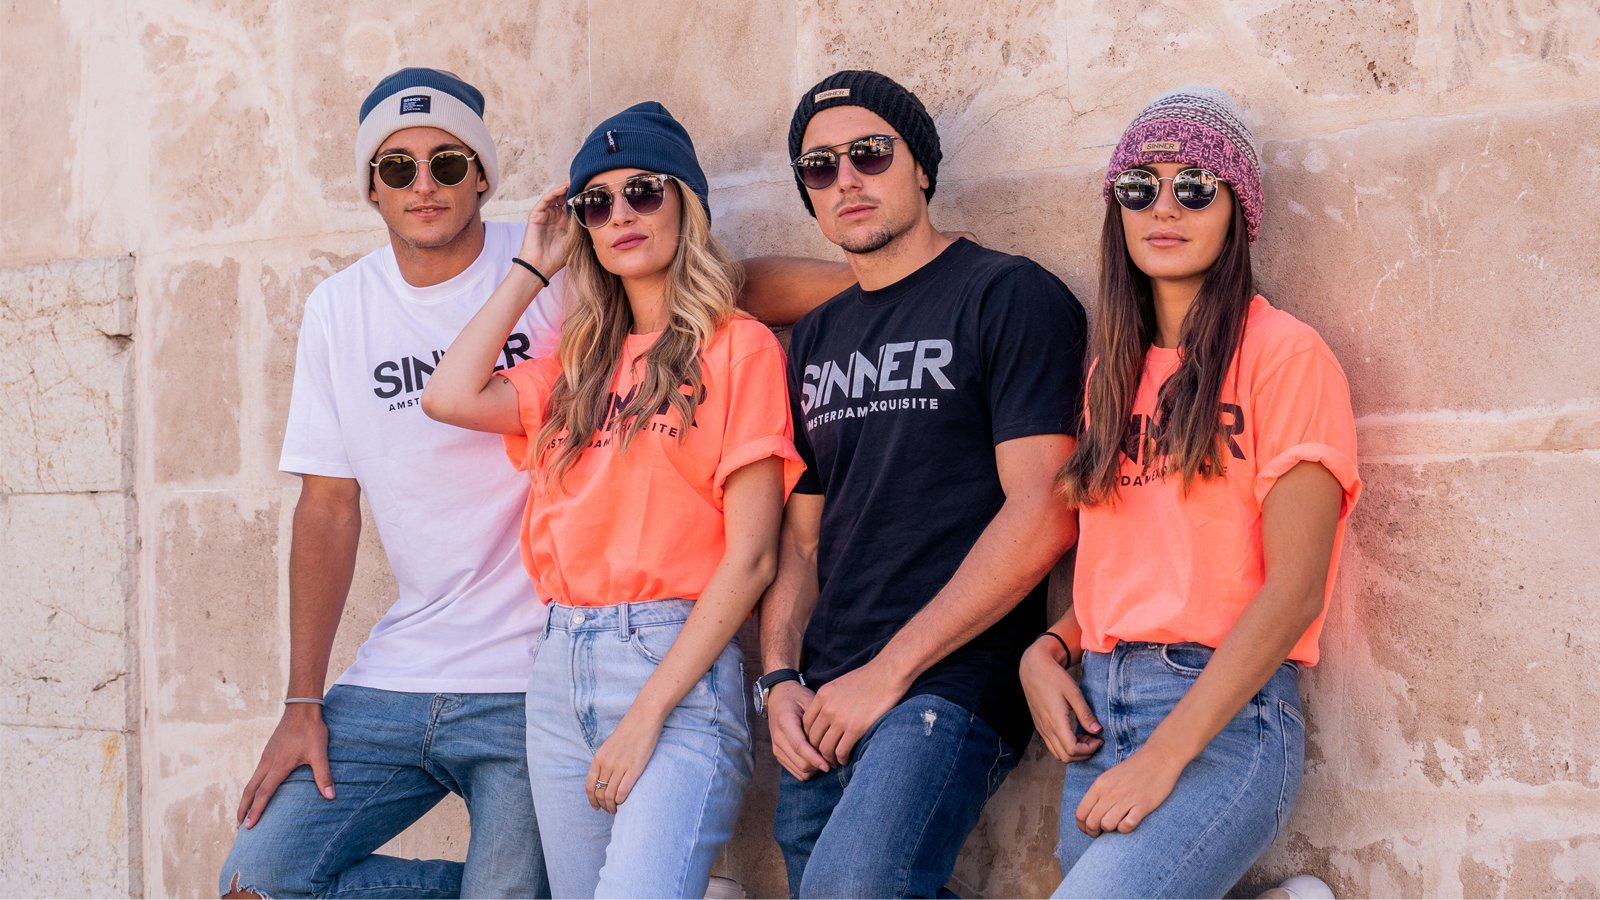 SINNER 2021 Sunglasses Preview